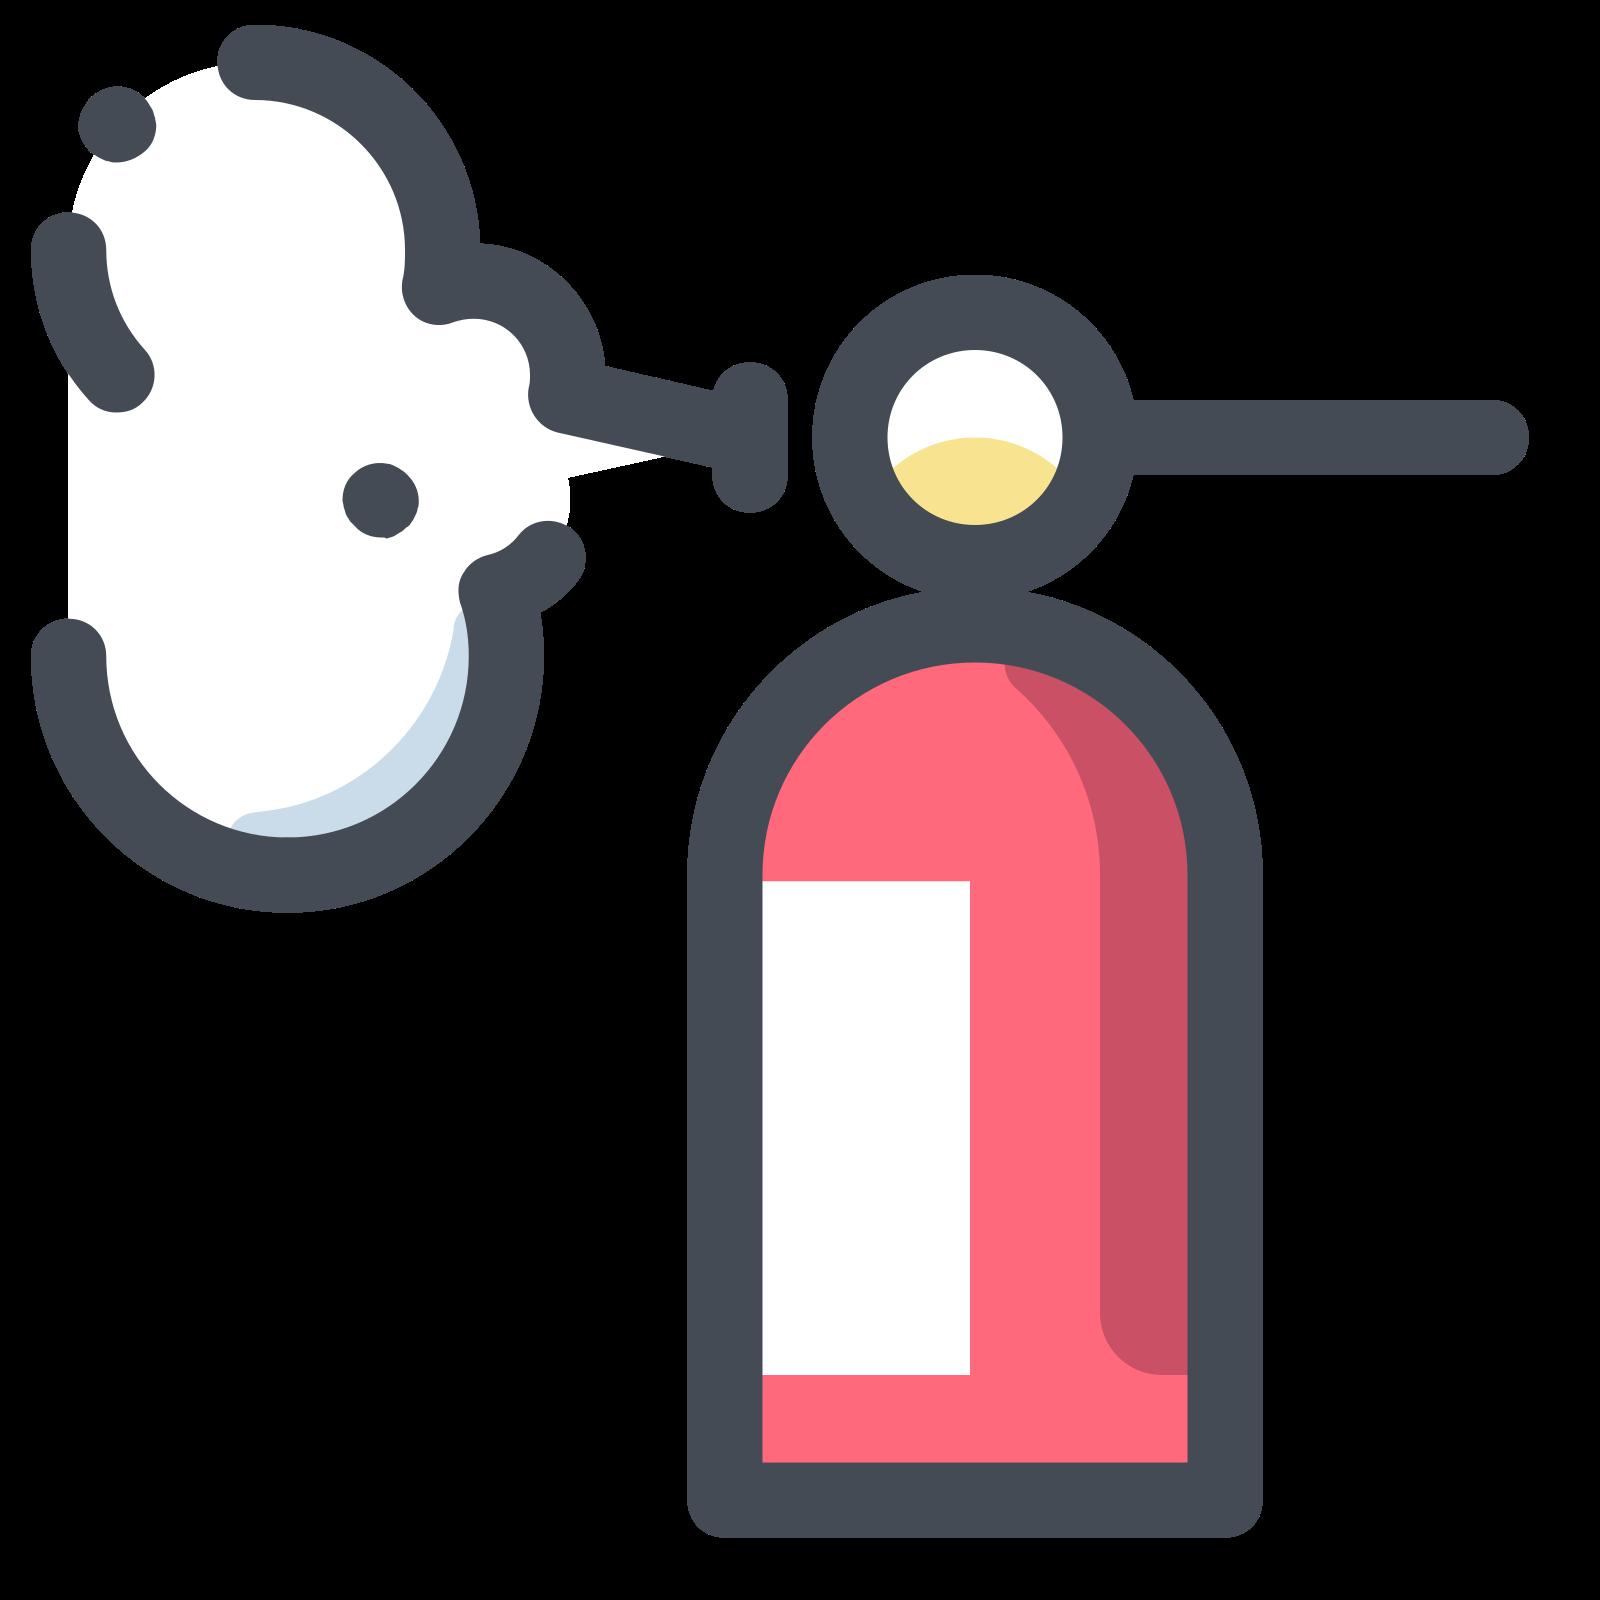 Foam Fire Extinguisher icon